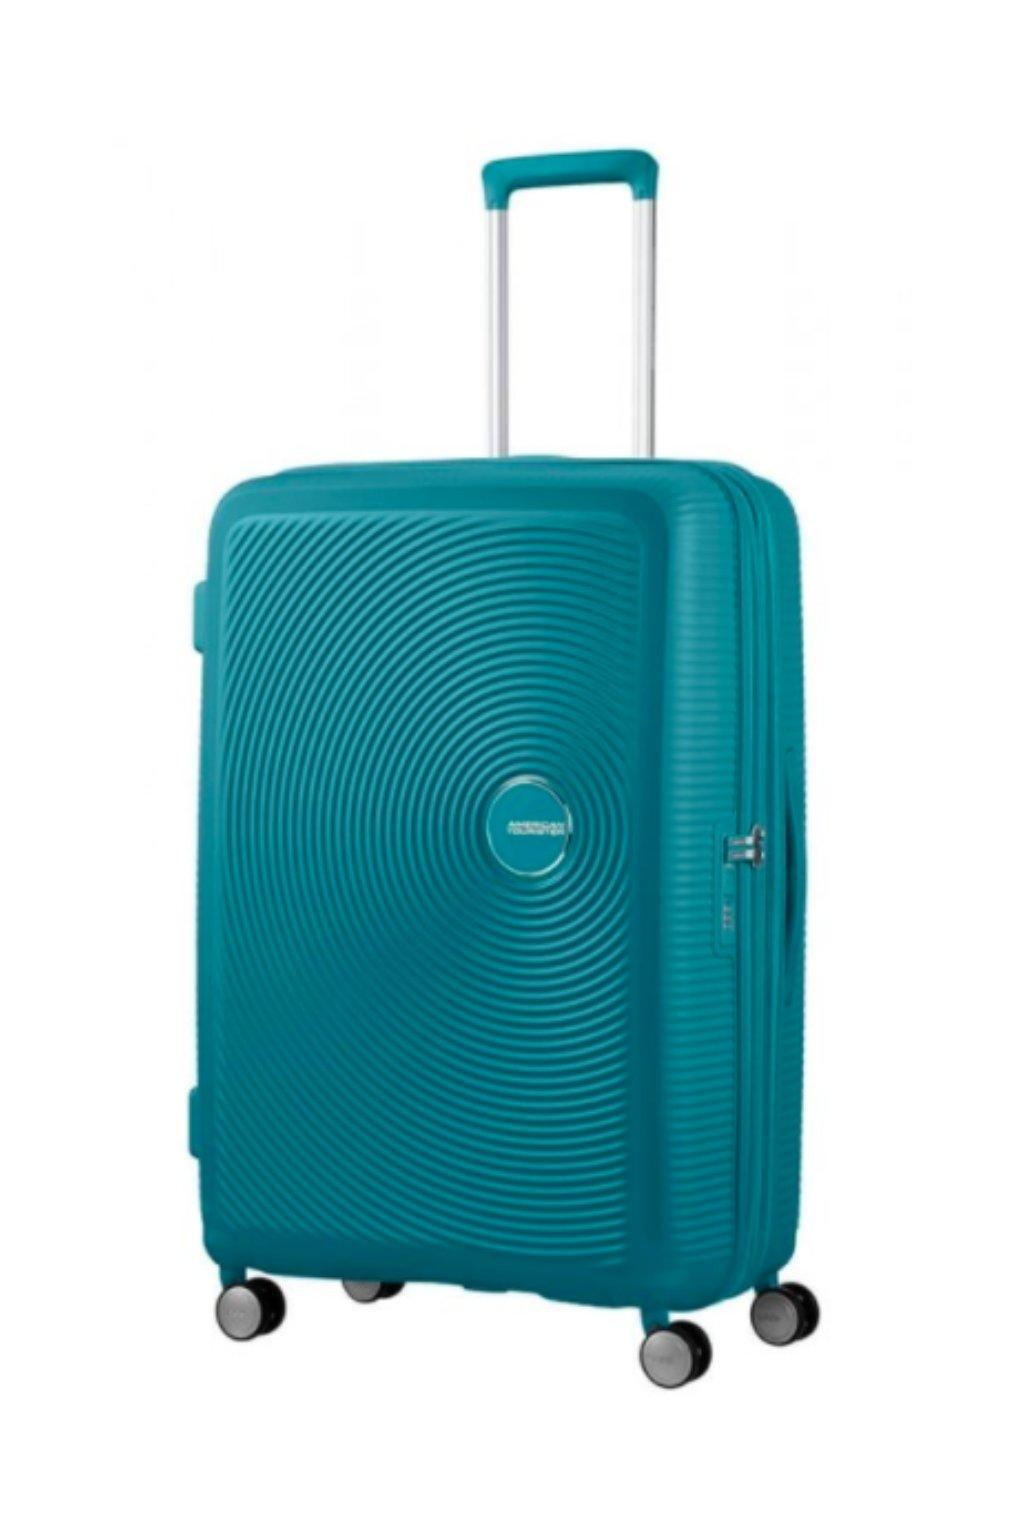 kufrland americantourister soundbox jadegreen 55 (8)